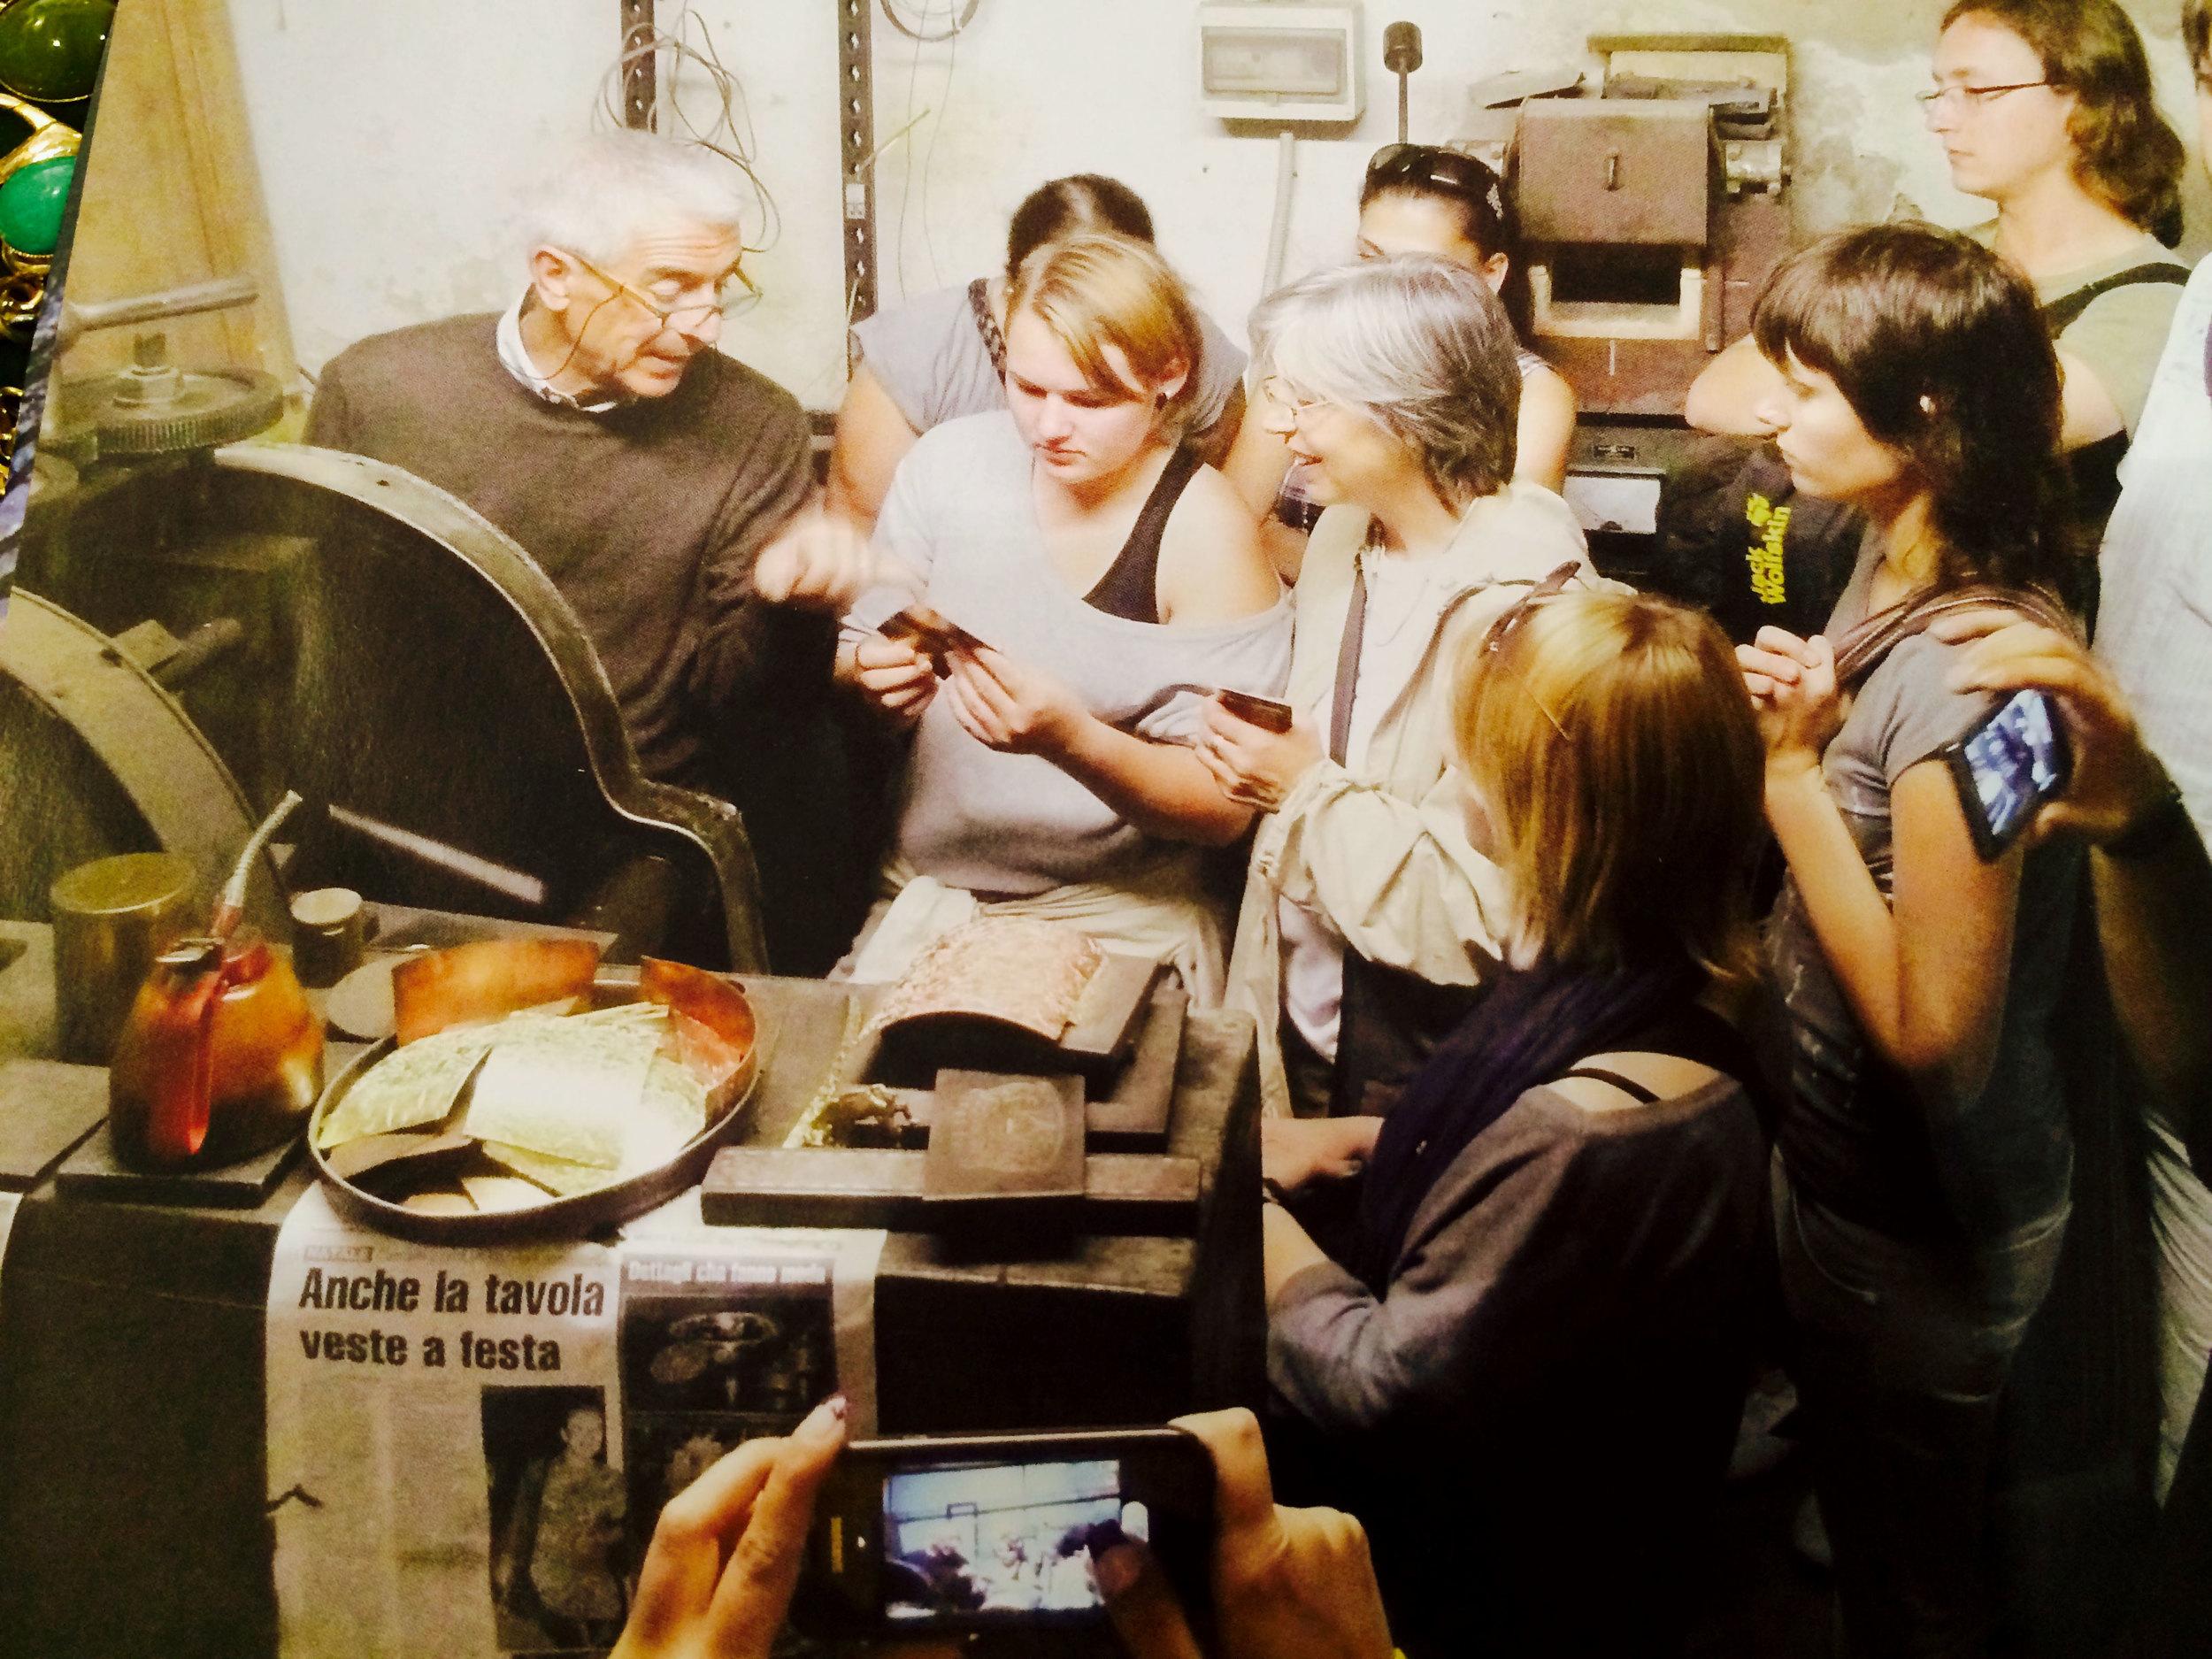 Giuliano Ricchi providing a tour of his studio in Florence.